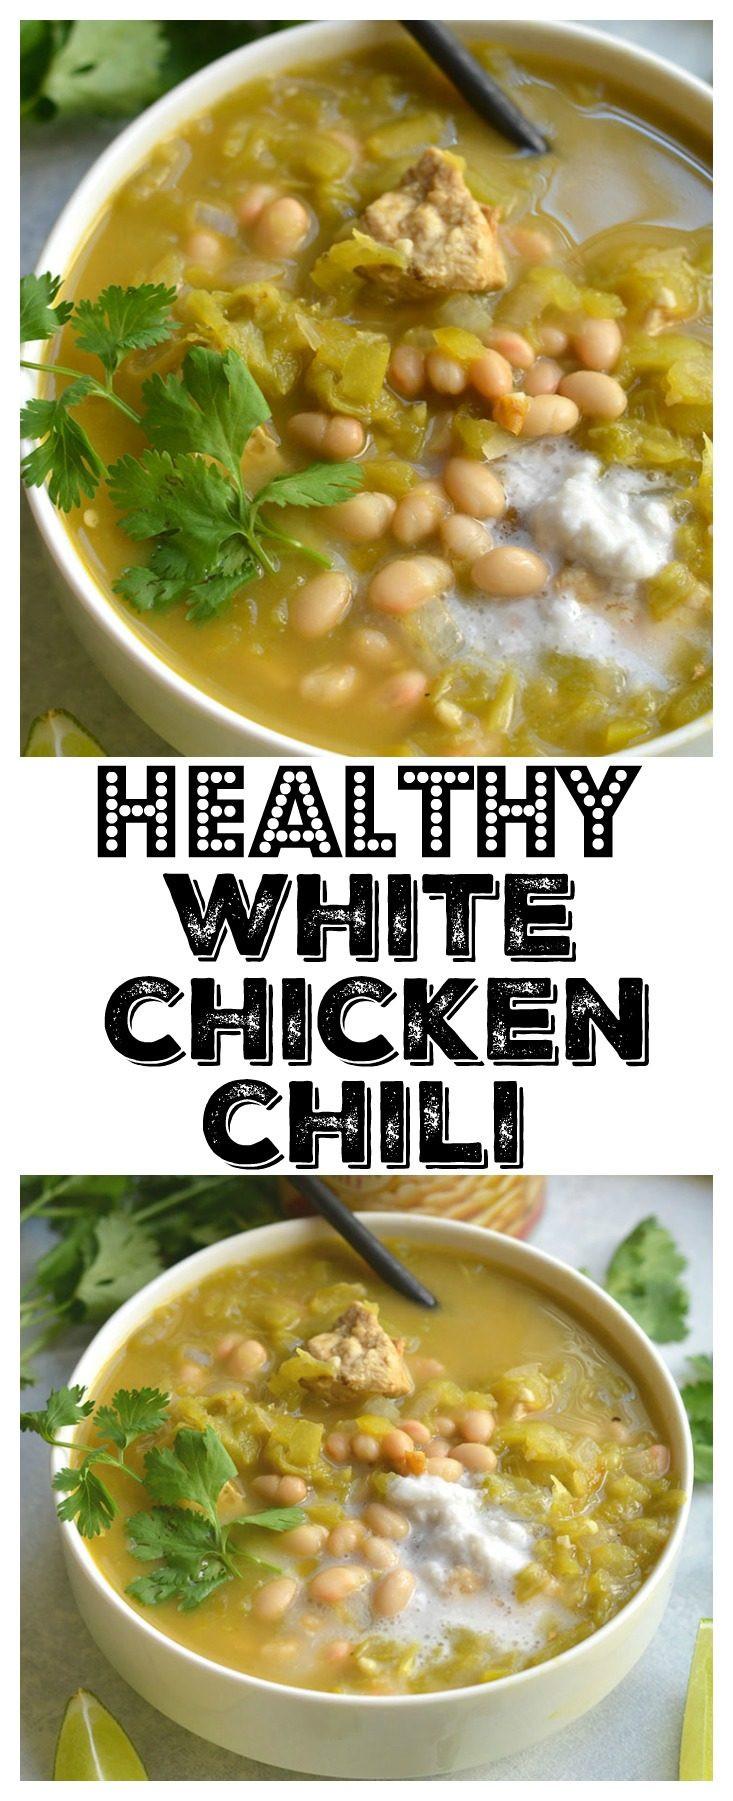 Healthy White Chicken Chili  Healthy White Chicken Chili GF Low Cal Skinny